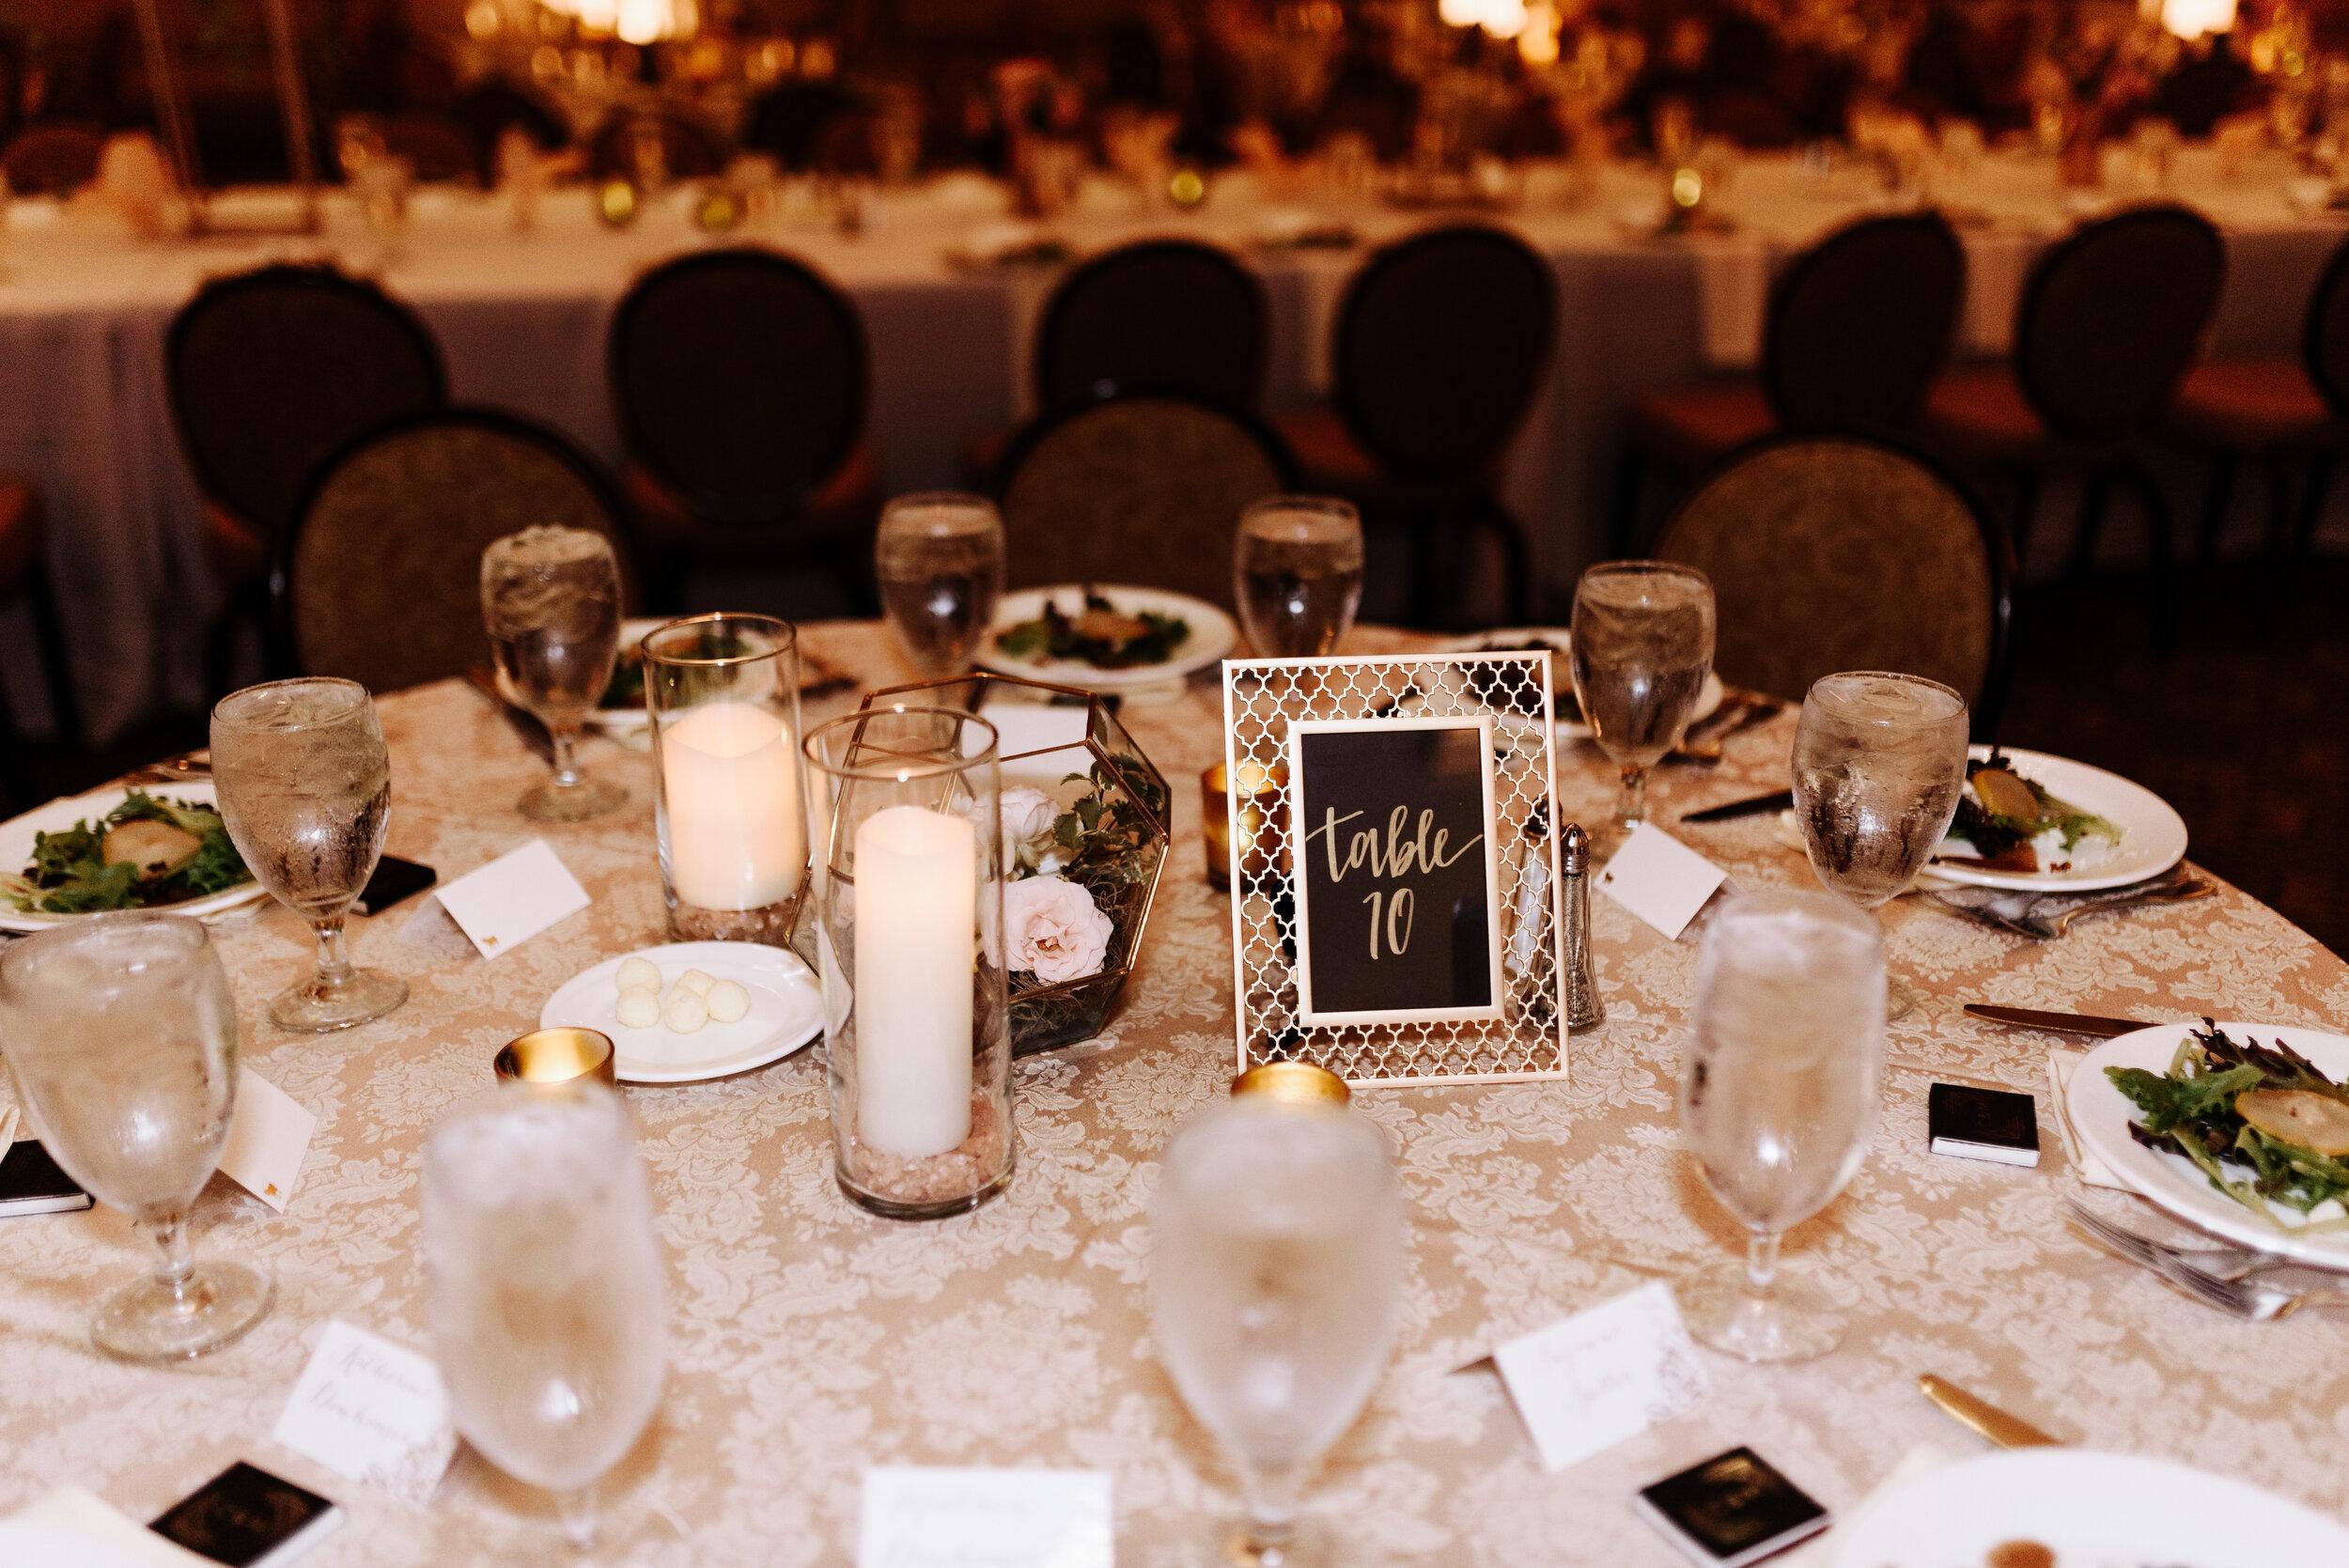 Cassie-Mrunal-Wedding-Quirk-Hotel-John-Marshall-Ballrooms-Richmond-Virginia-Photography-by-V-86.jpg